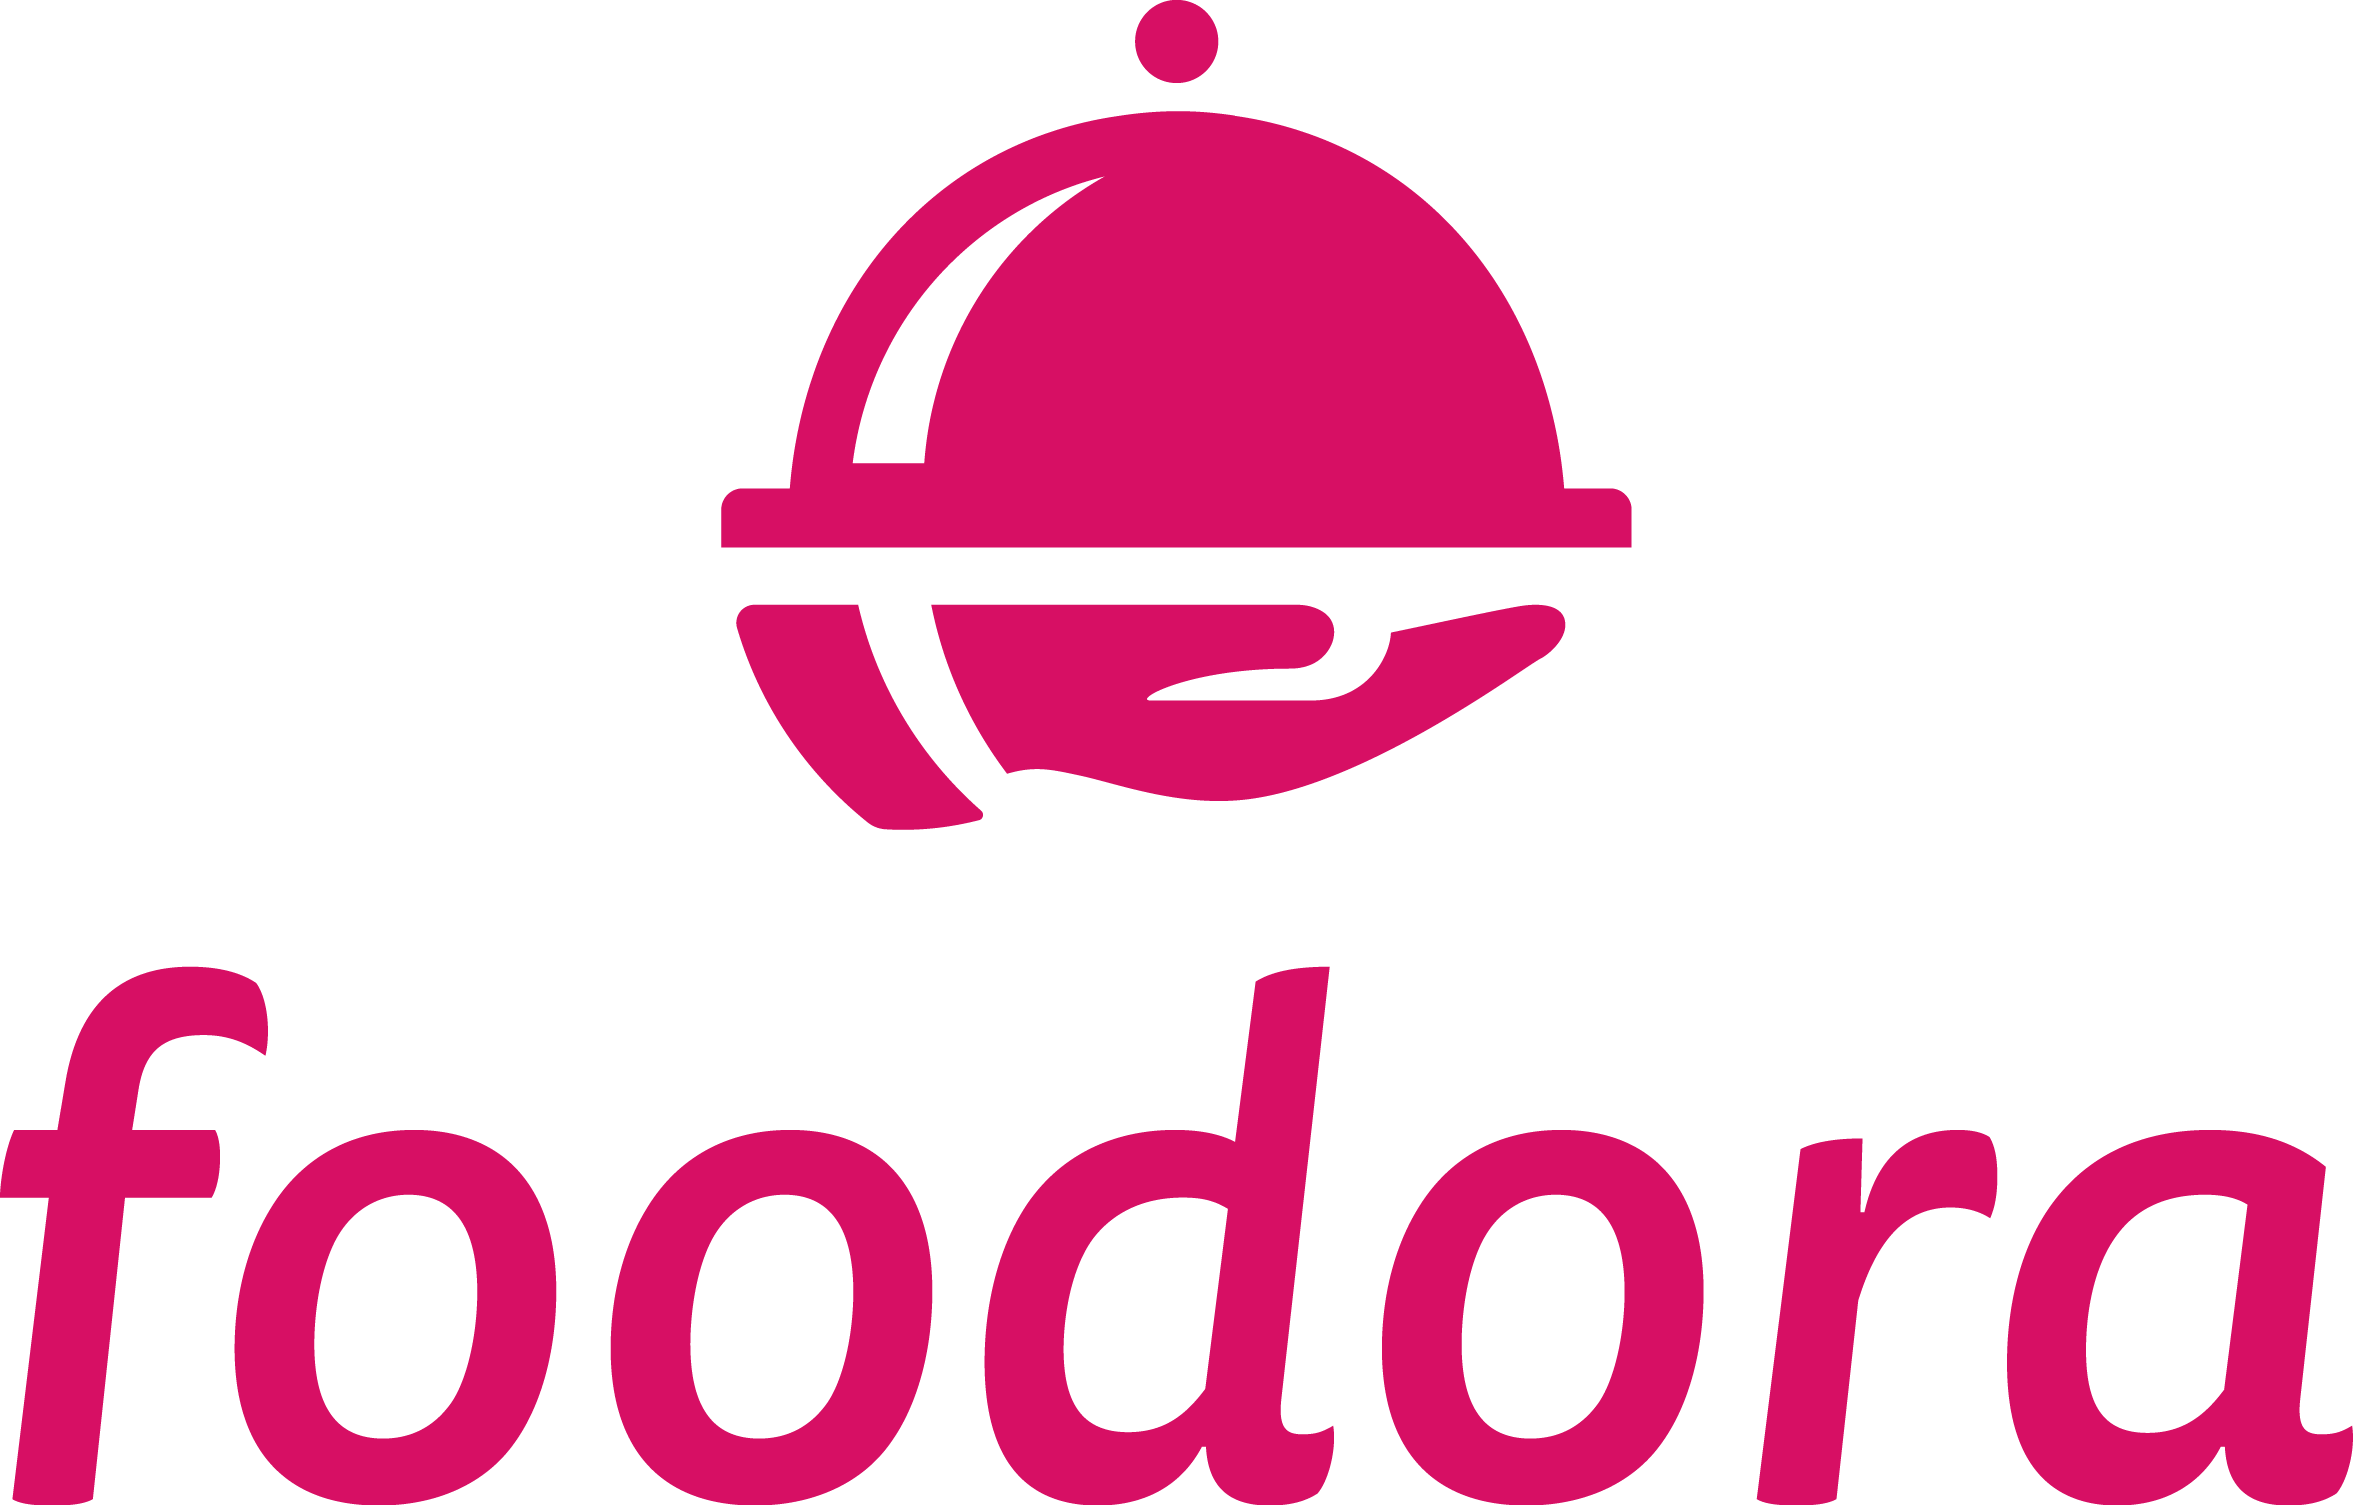 Foodora.se